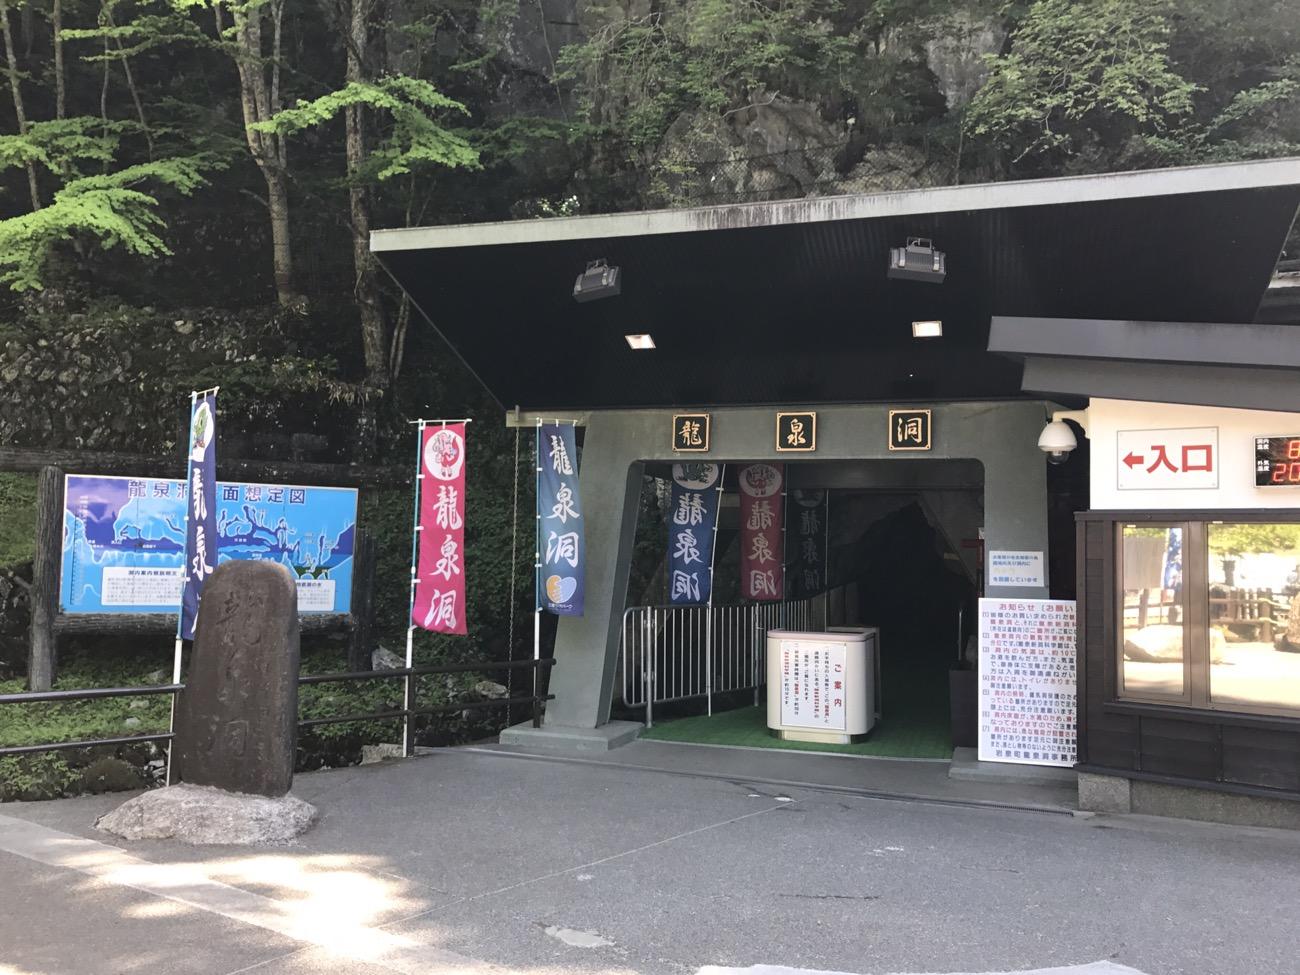 龍泉洞入り口 岩泉観光